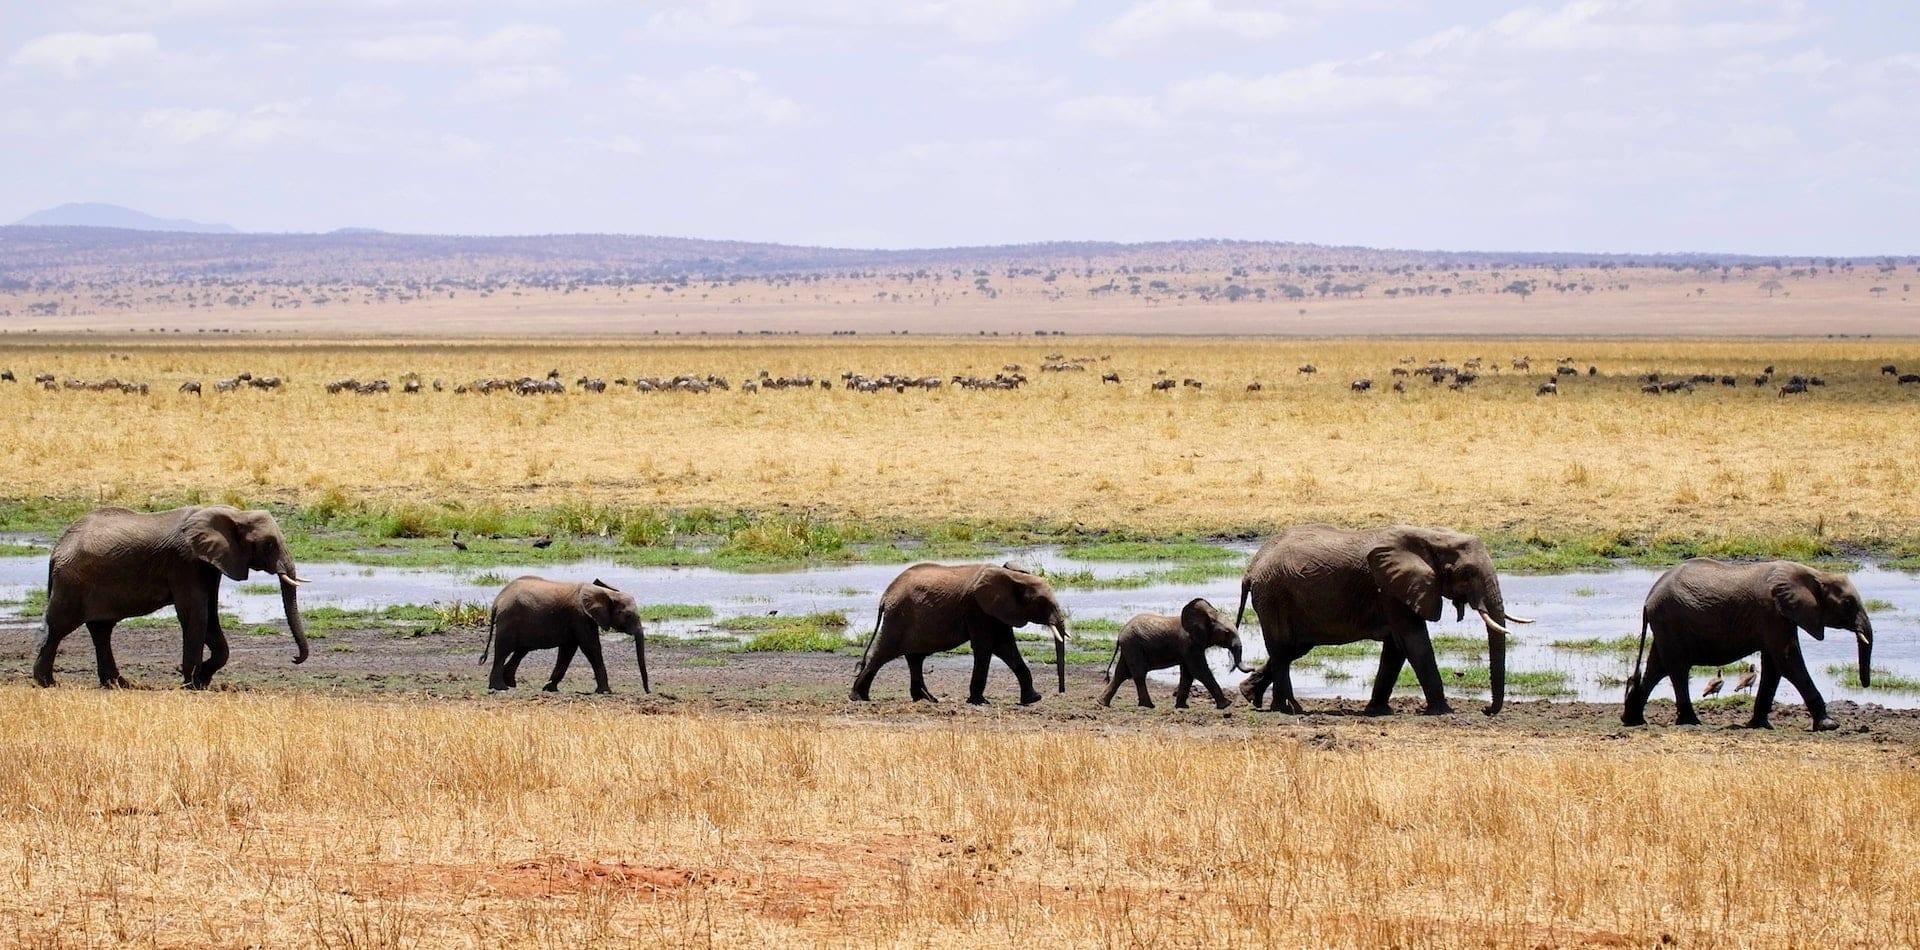 A family of elephants on an adventure across African plains